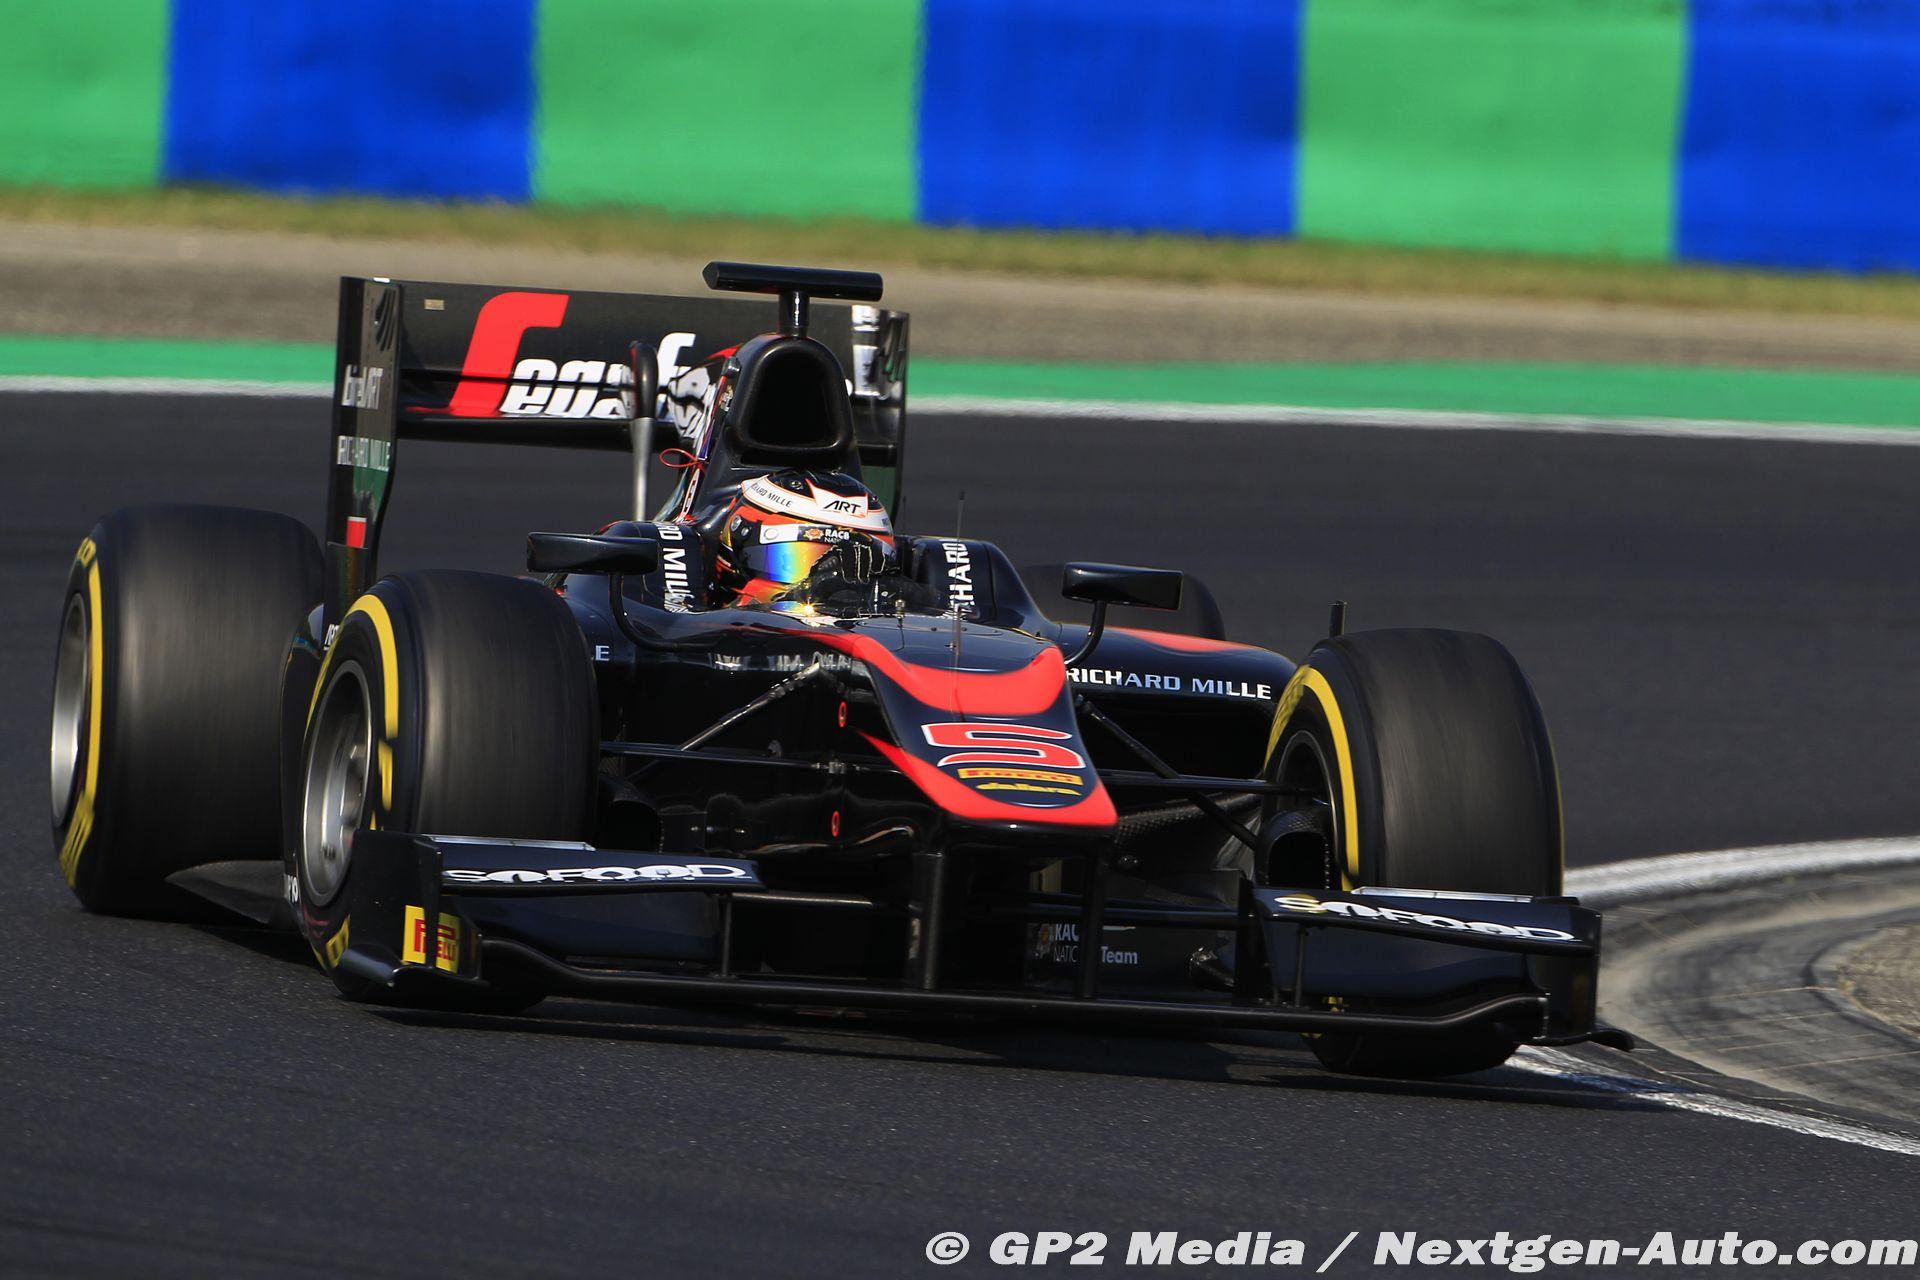 2015 GP2 Hongrie - Art Grand Prix - Stoffel Vandoorne